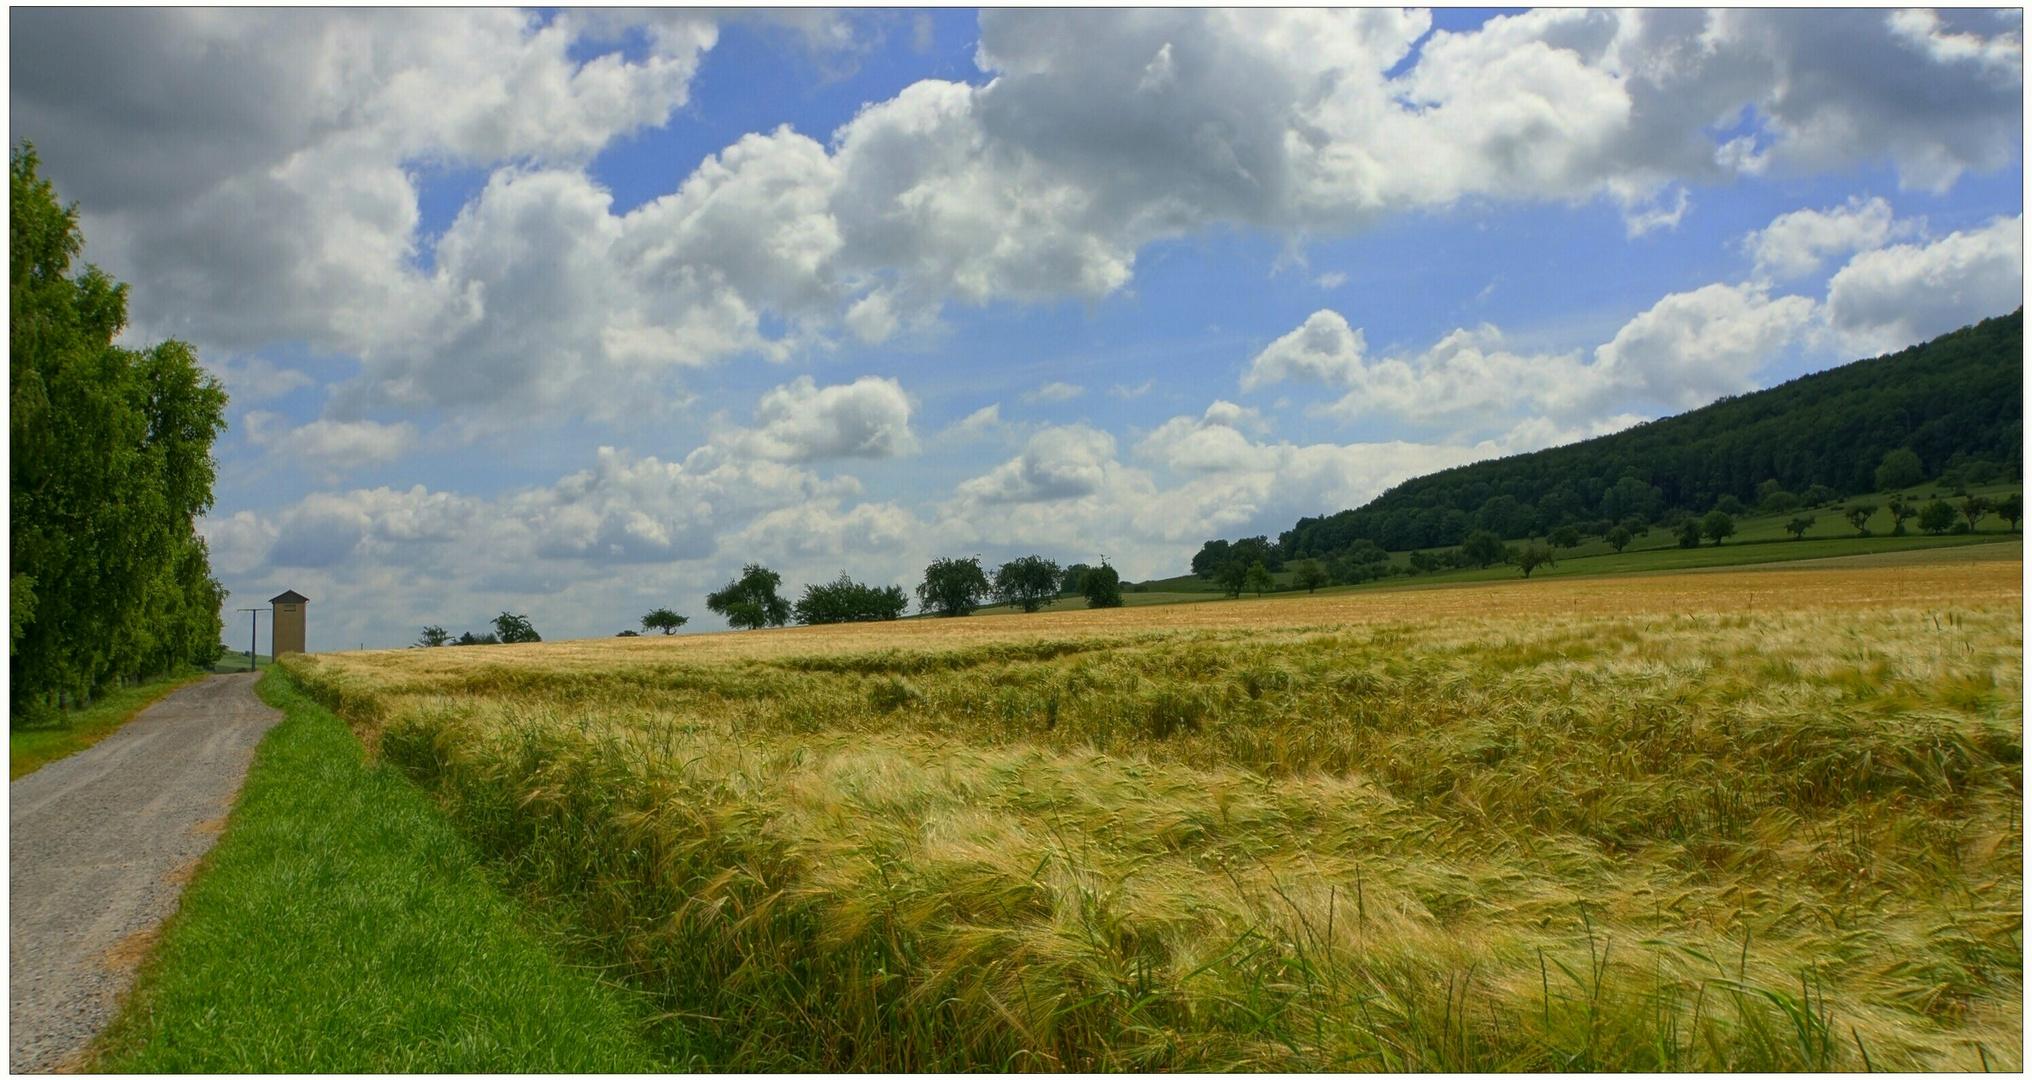 Getreidefeld VI (campo de cereales VI)